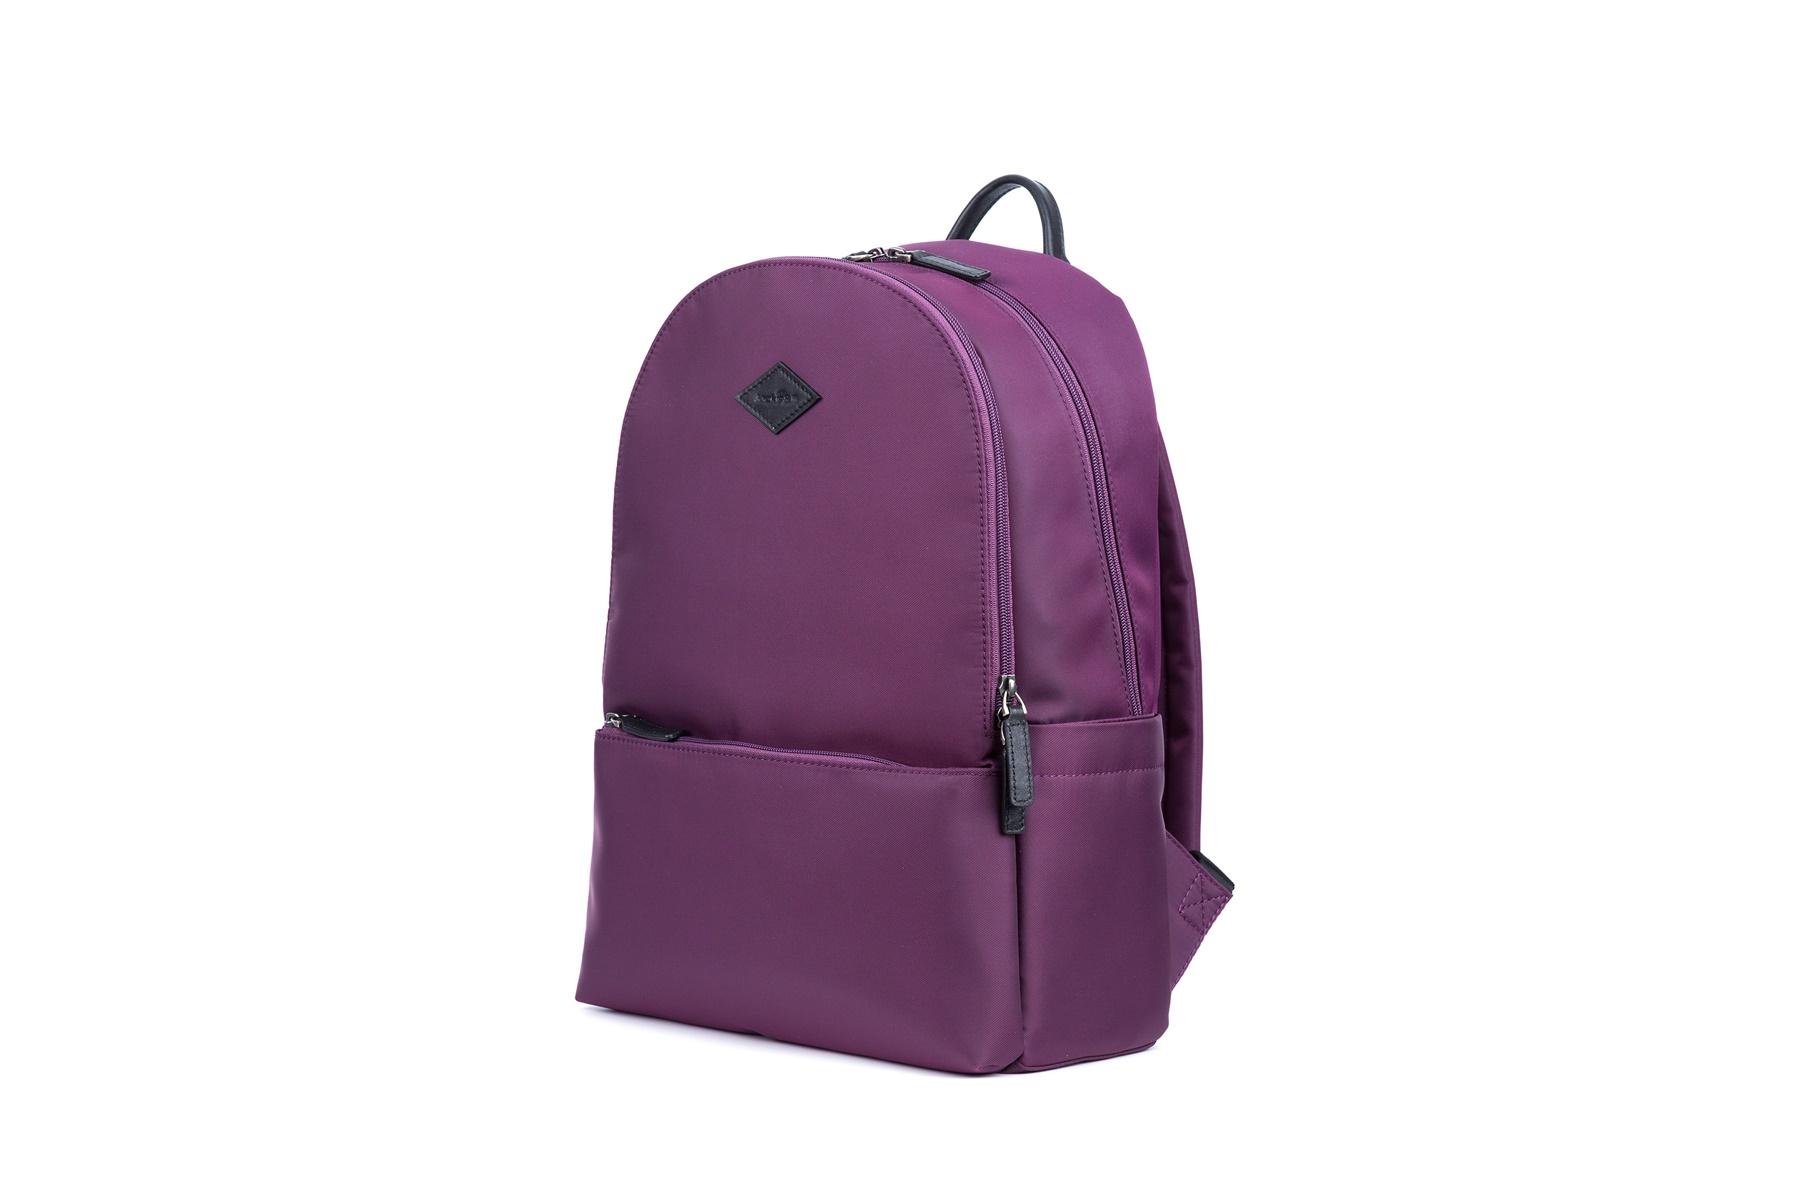 GF bags-Professional Stylish Backpacks Big Backpack Bags Manufacture-3